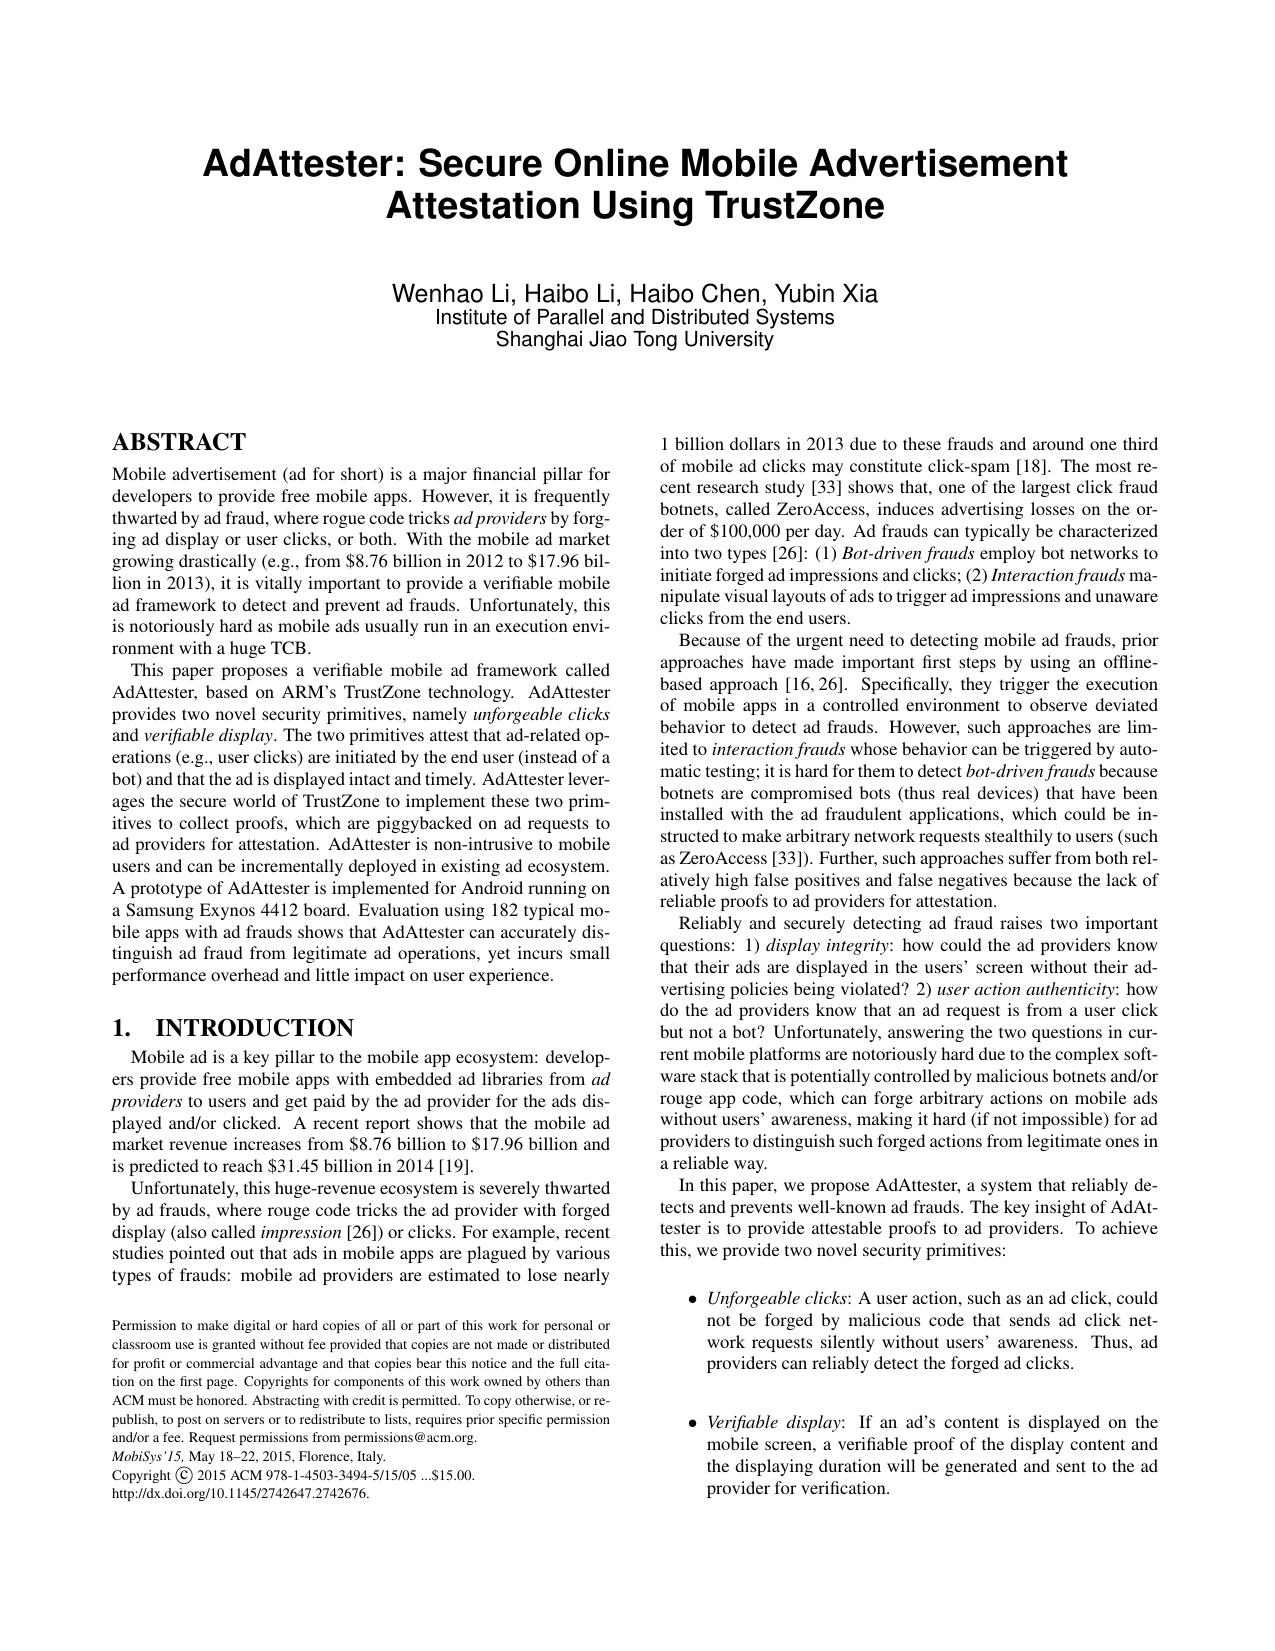 AdAttester: Secure Online Mobile Advertisement Attestation Using